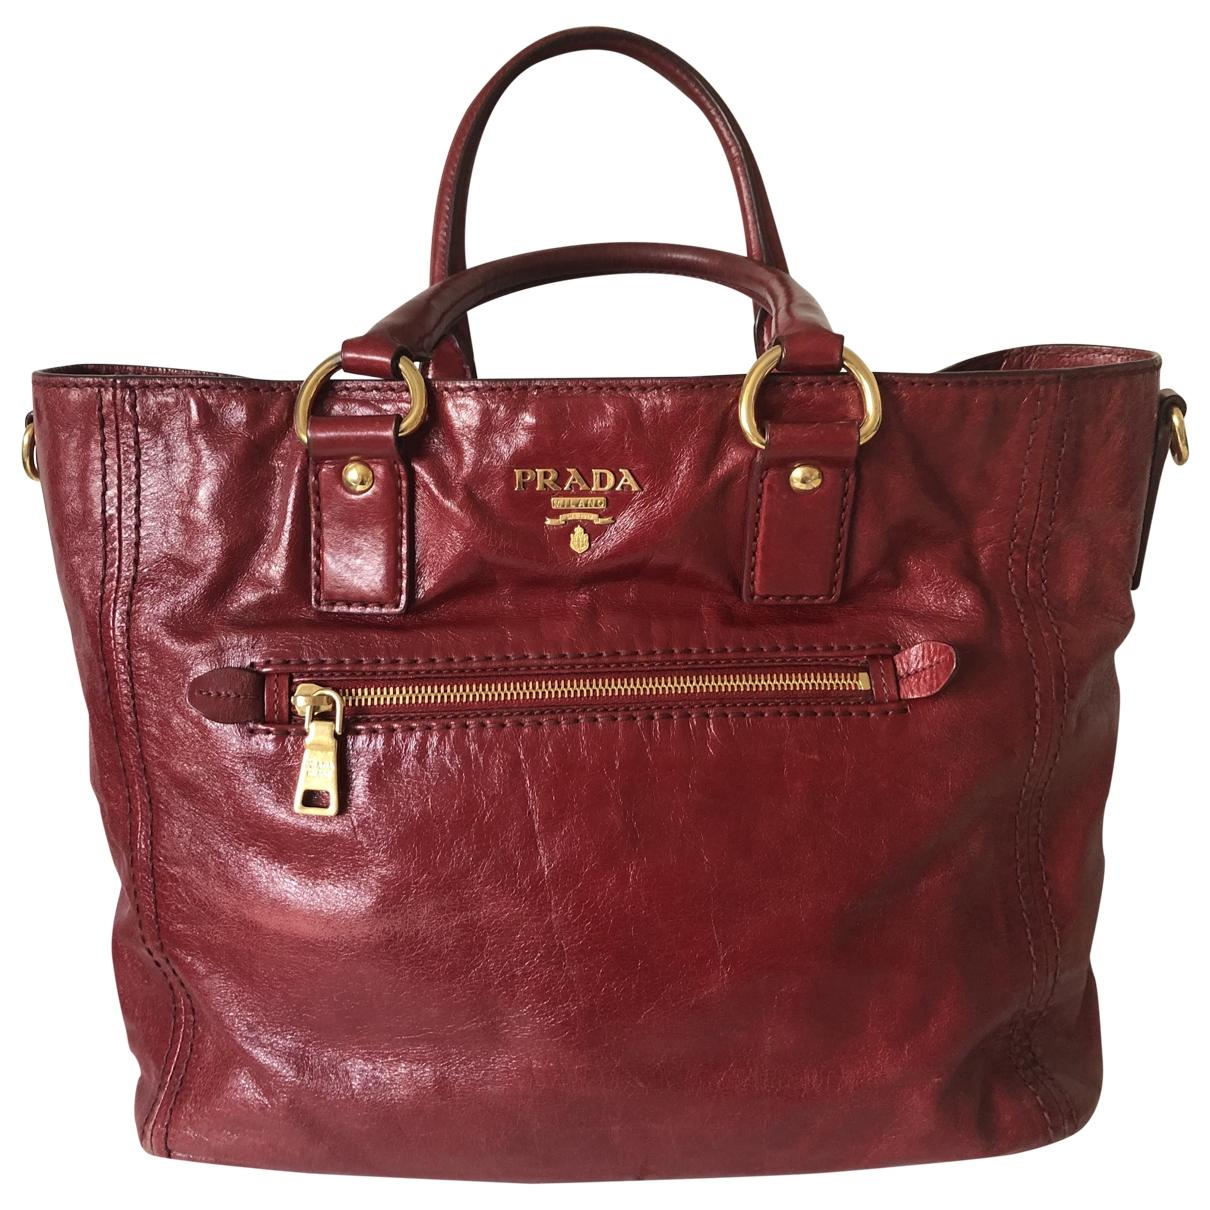 Prada \N Burgundy Leather handbag for Women \N